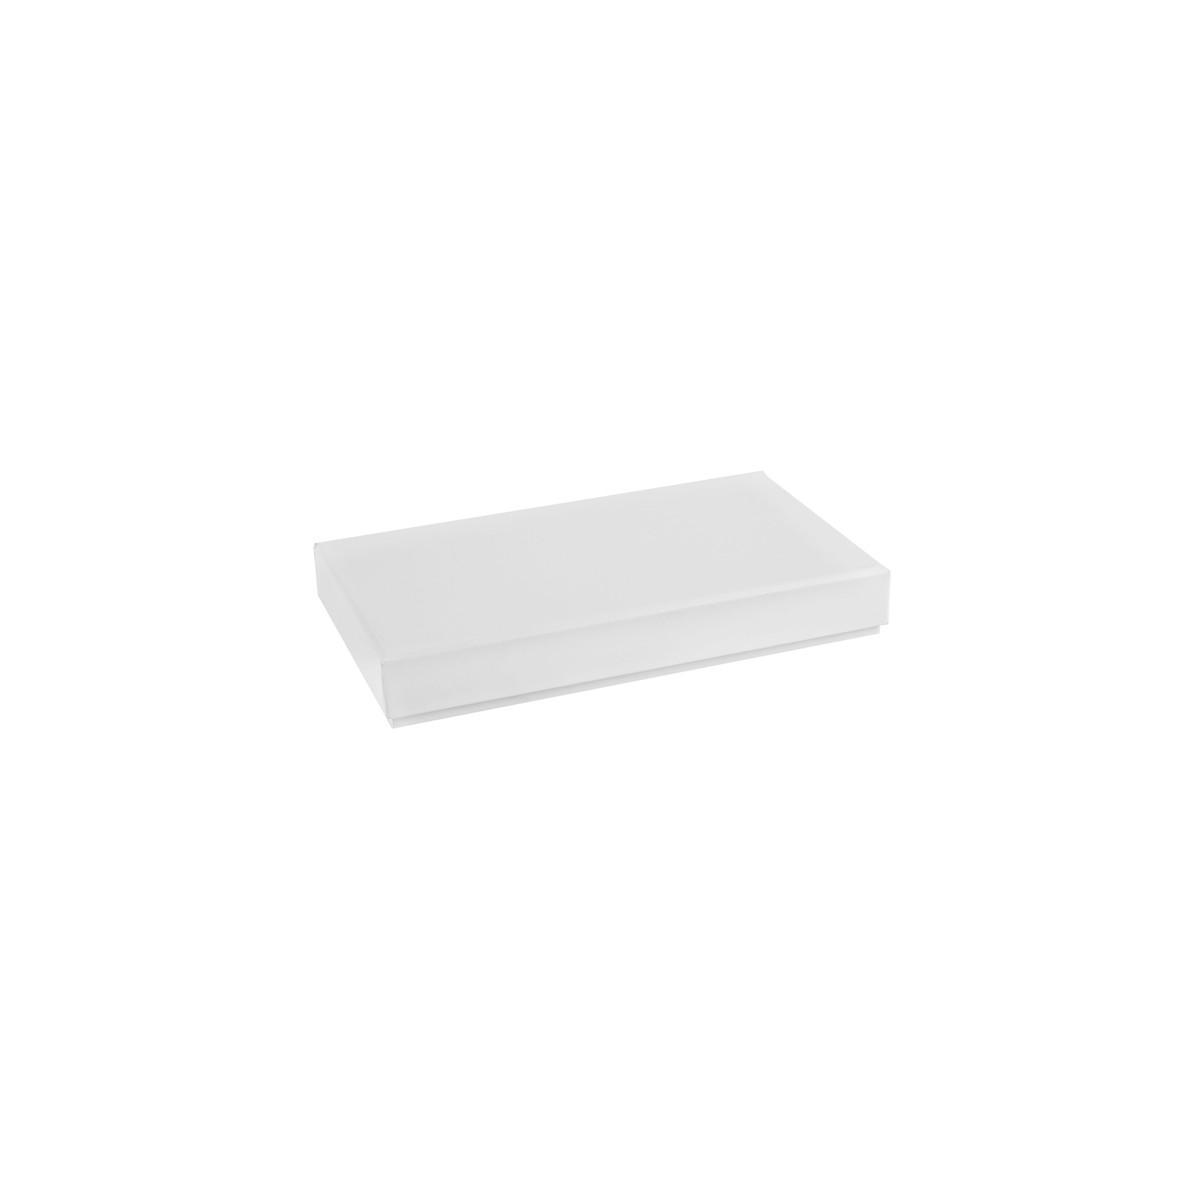 boite blanche id es coffret cadeau emballage. Black Bedroom Furniture Sets. Home Design Ideas